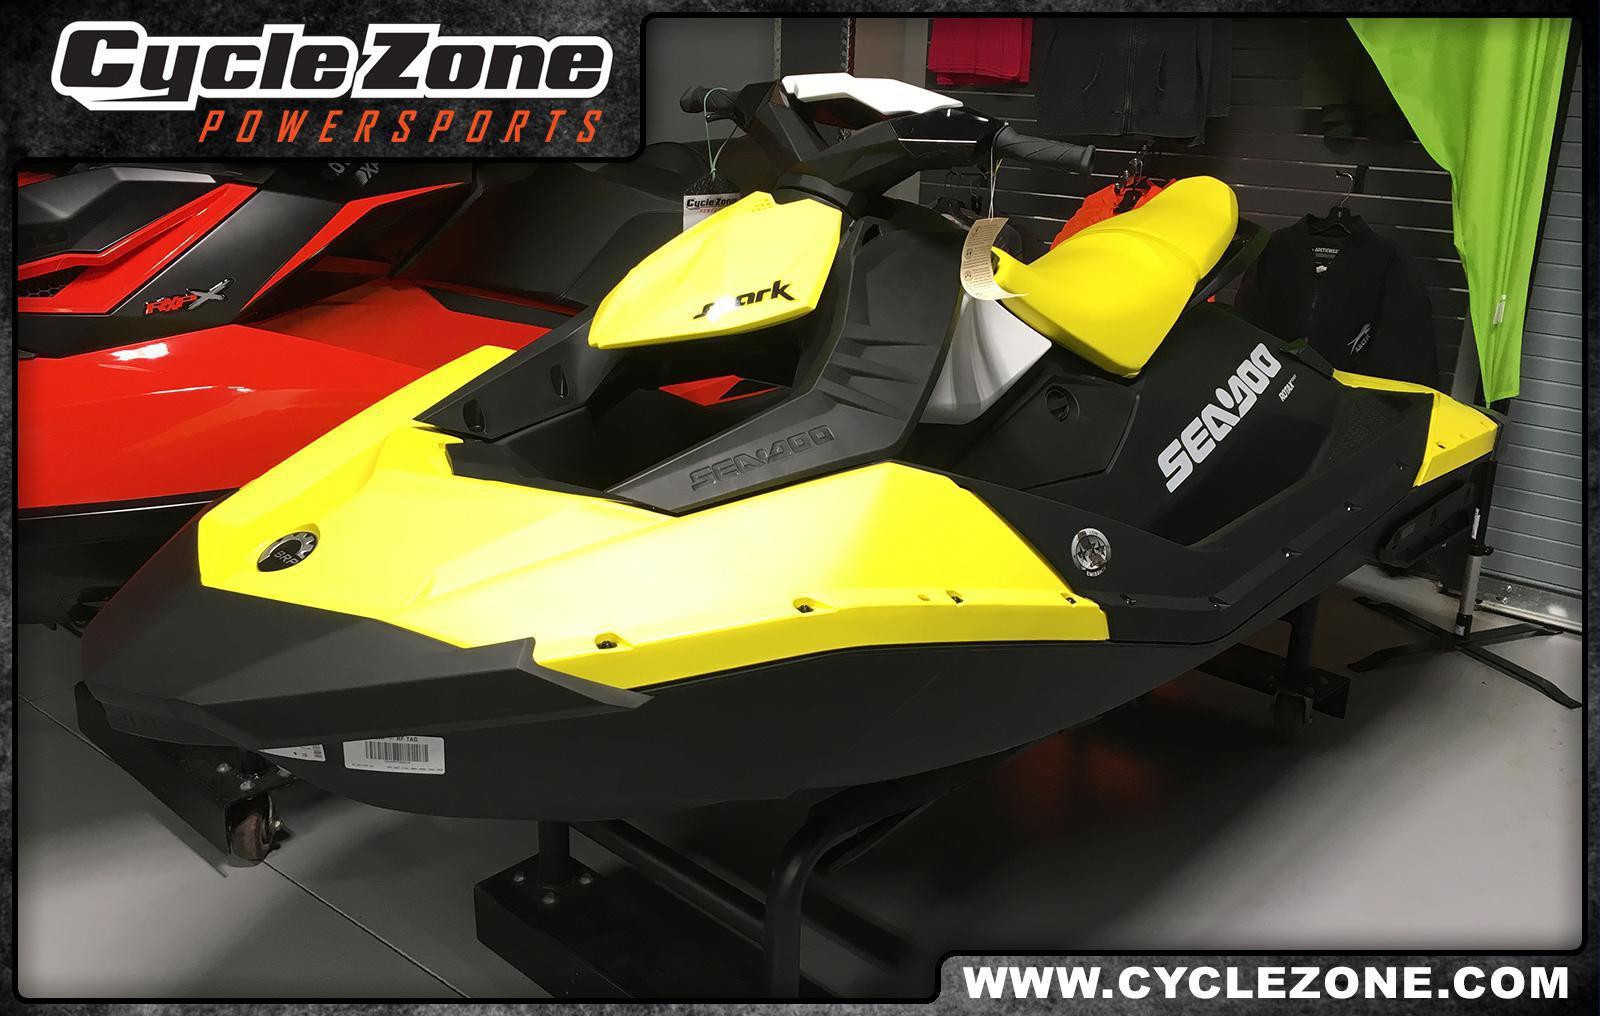 Cycle zone powersports for Ace motors topeka ks